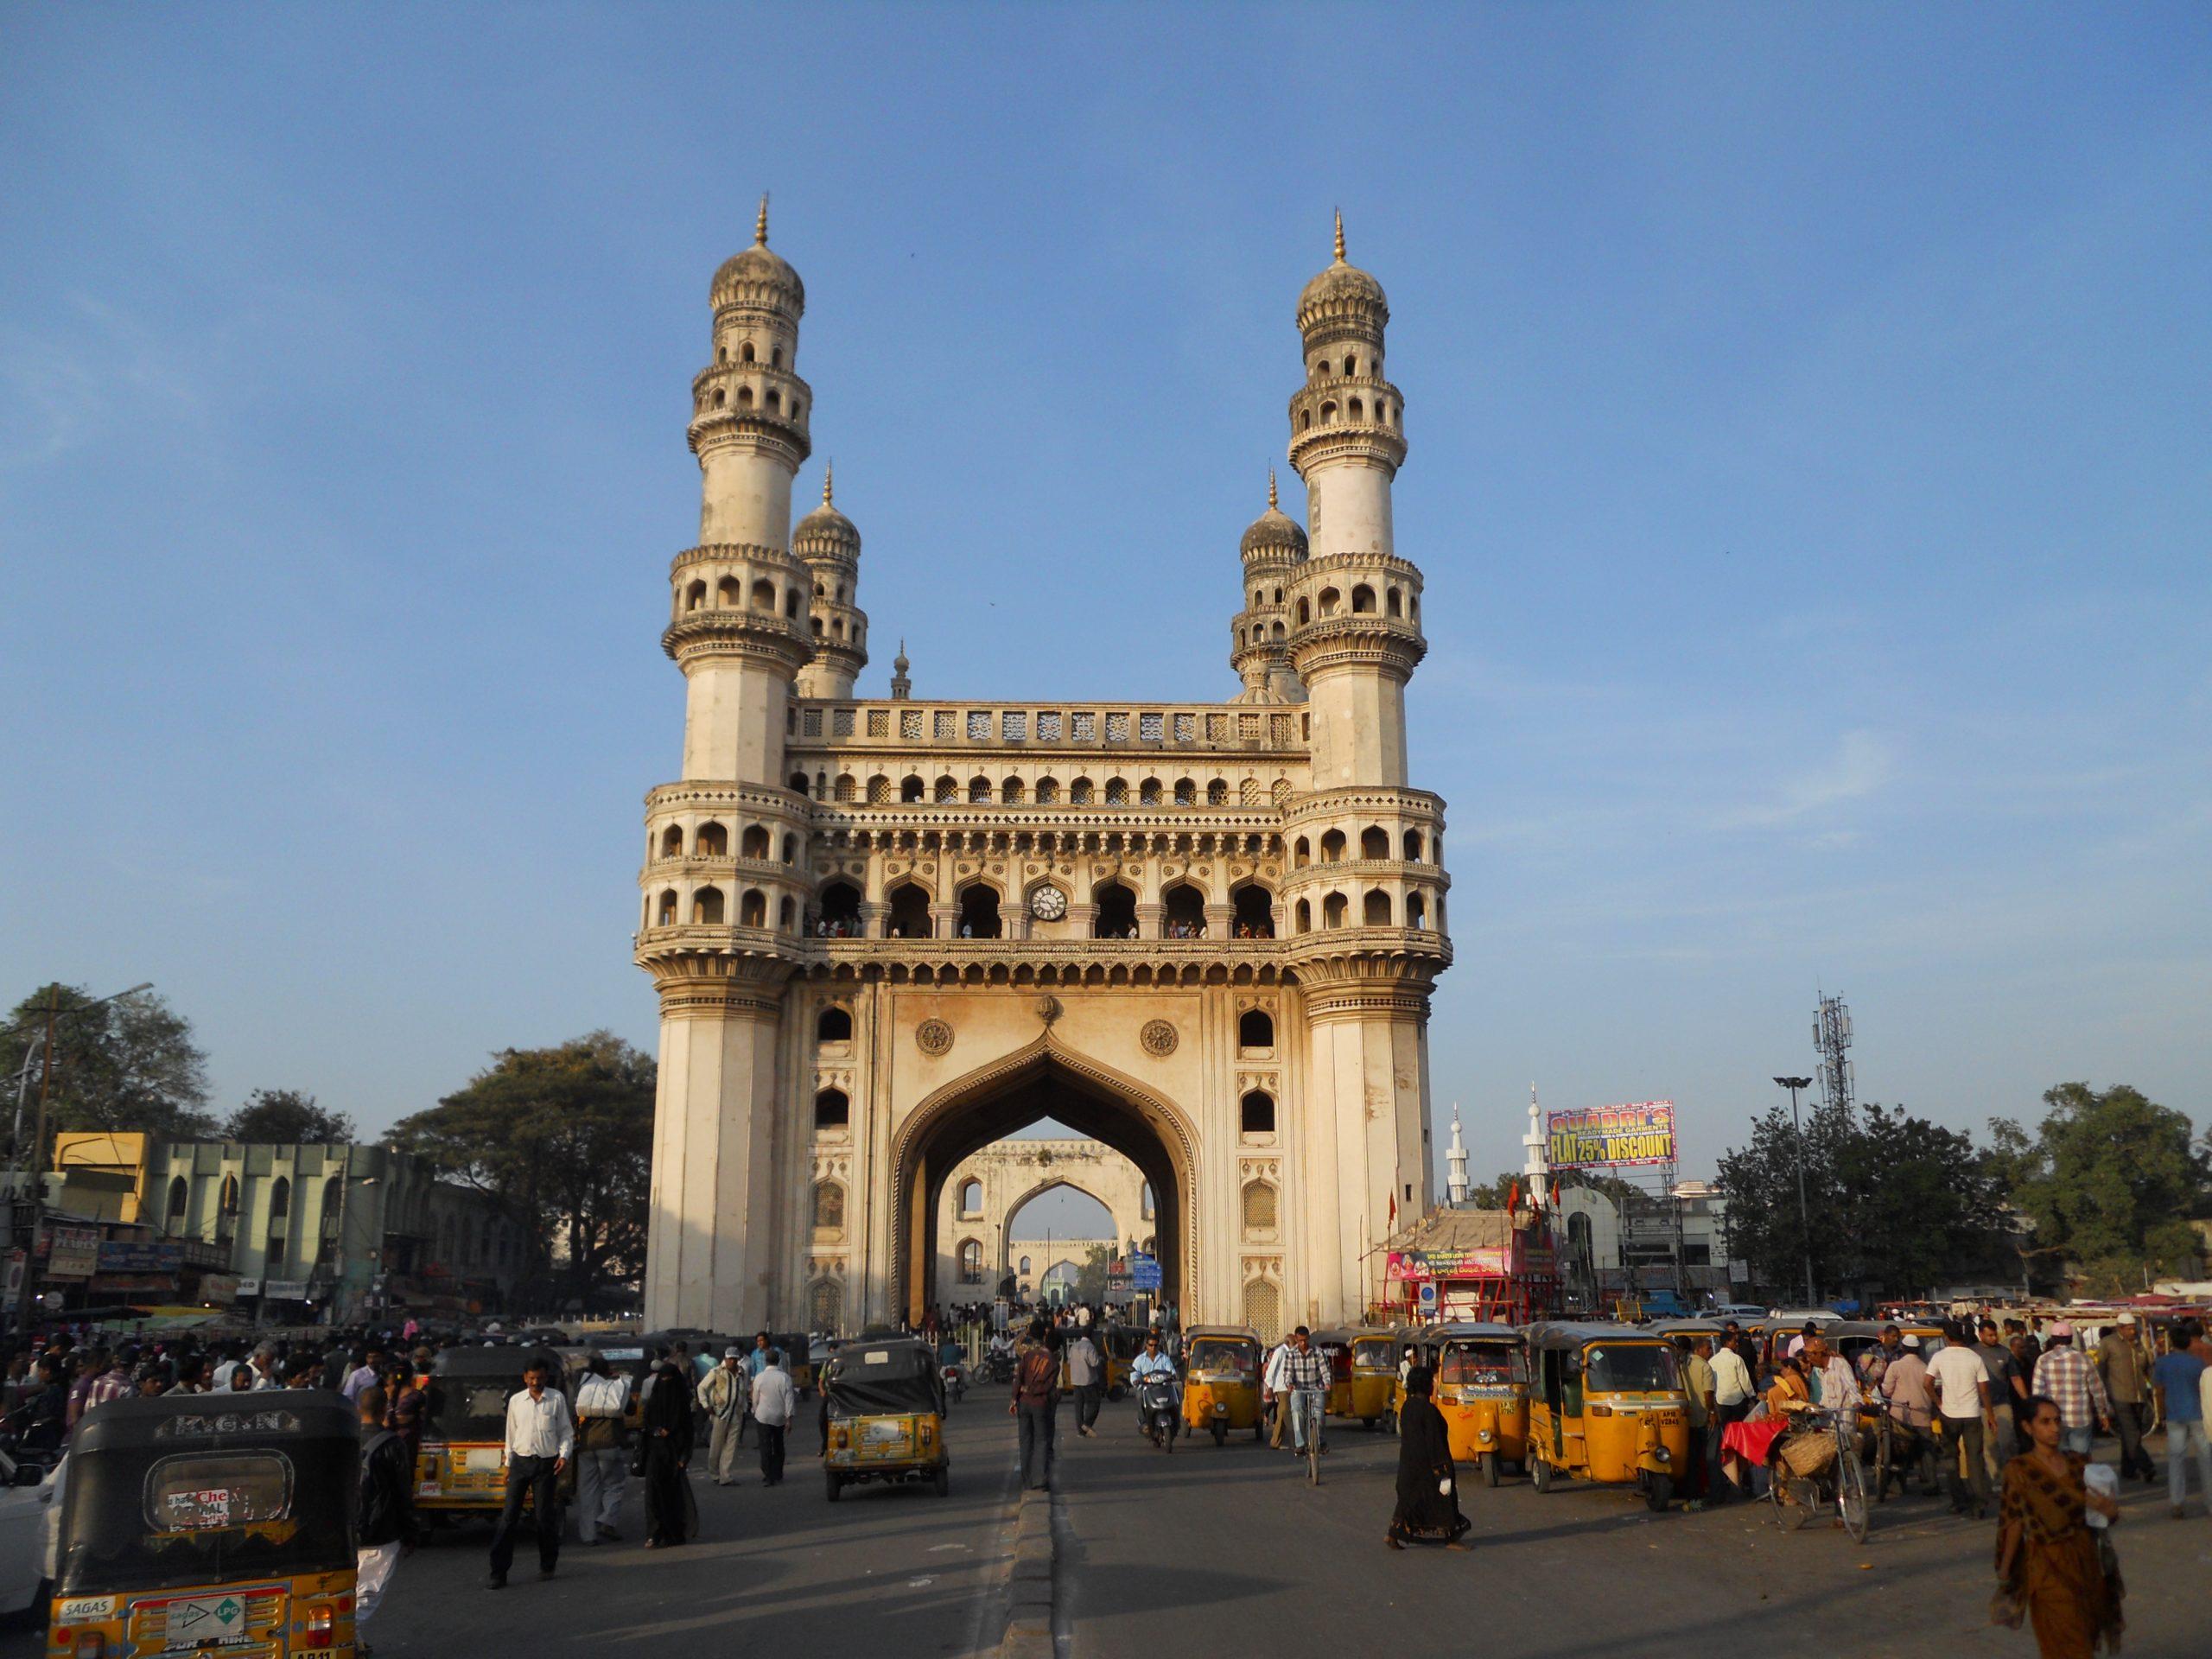 Charminar - The Go-To Tourist Destination of Hyderabad